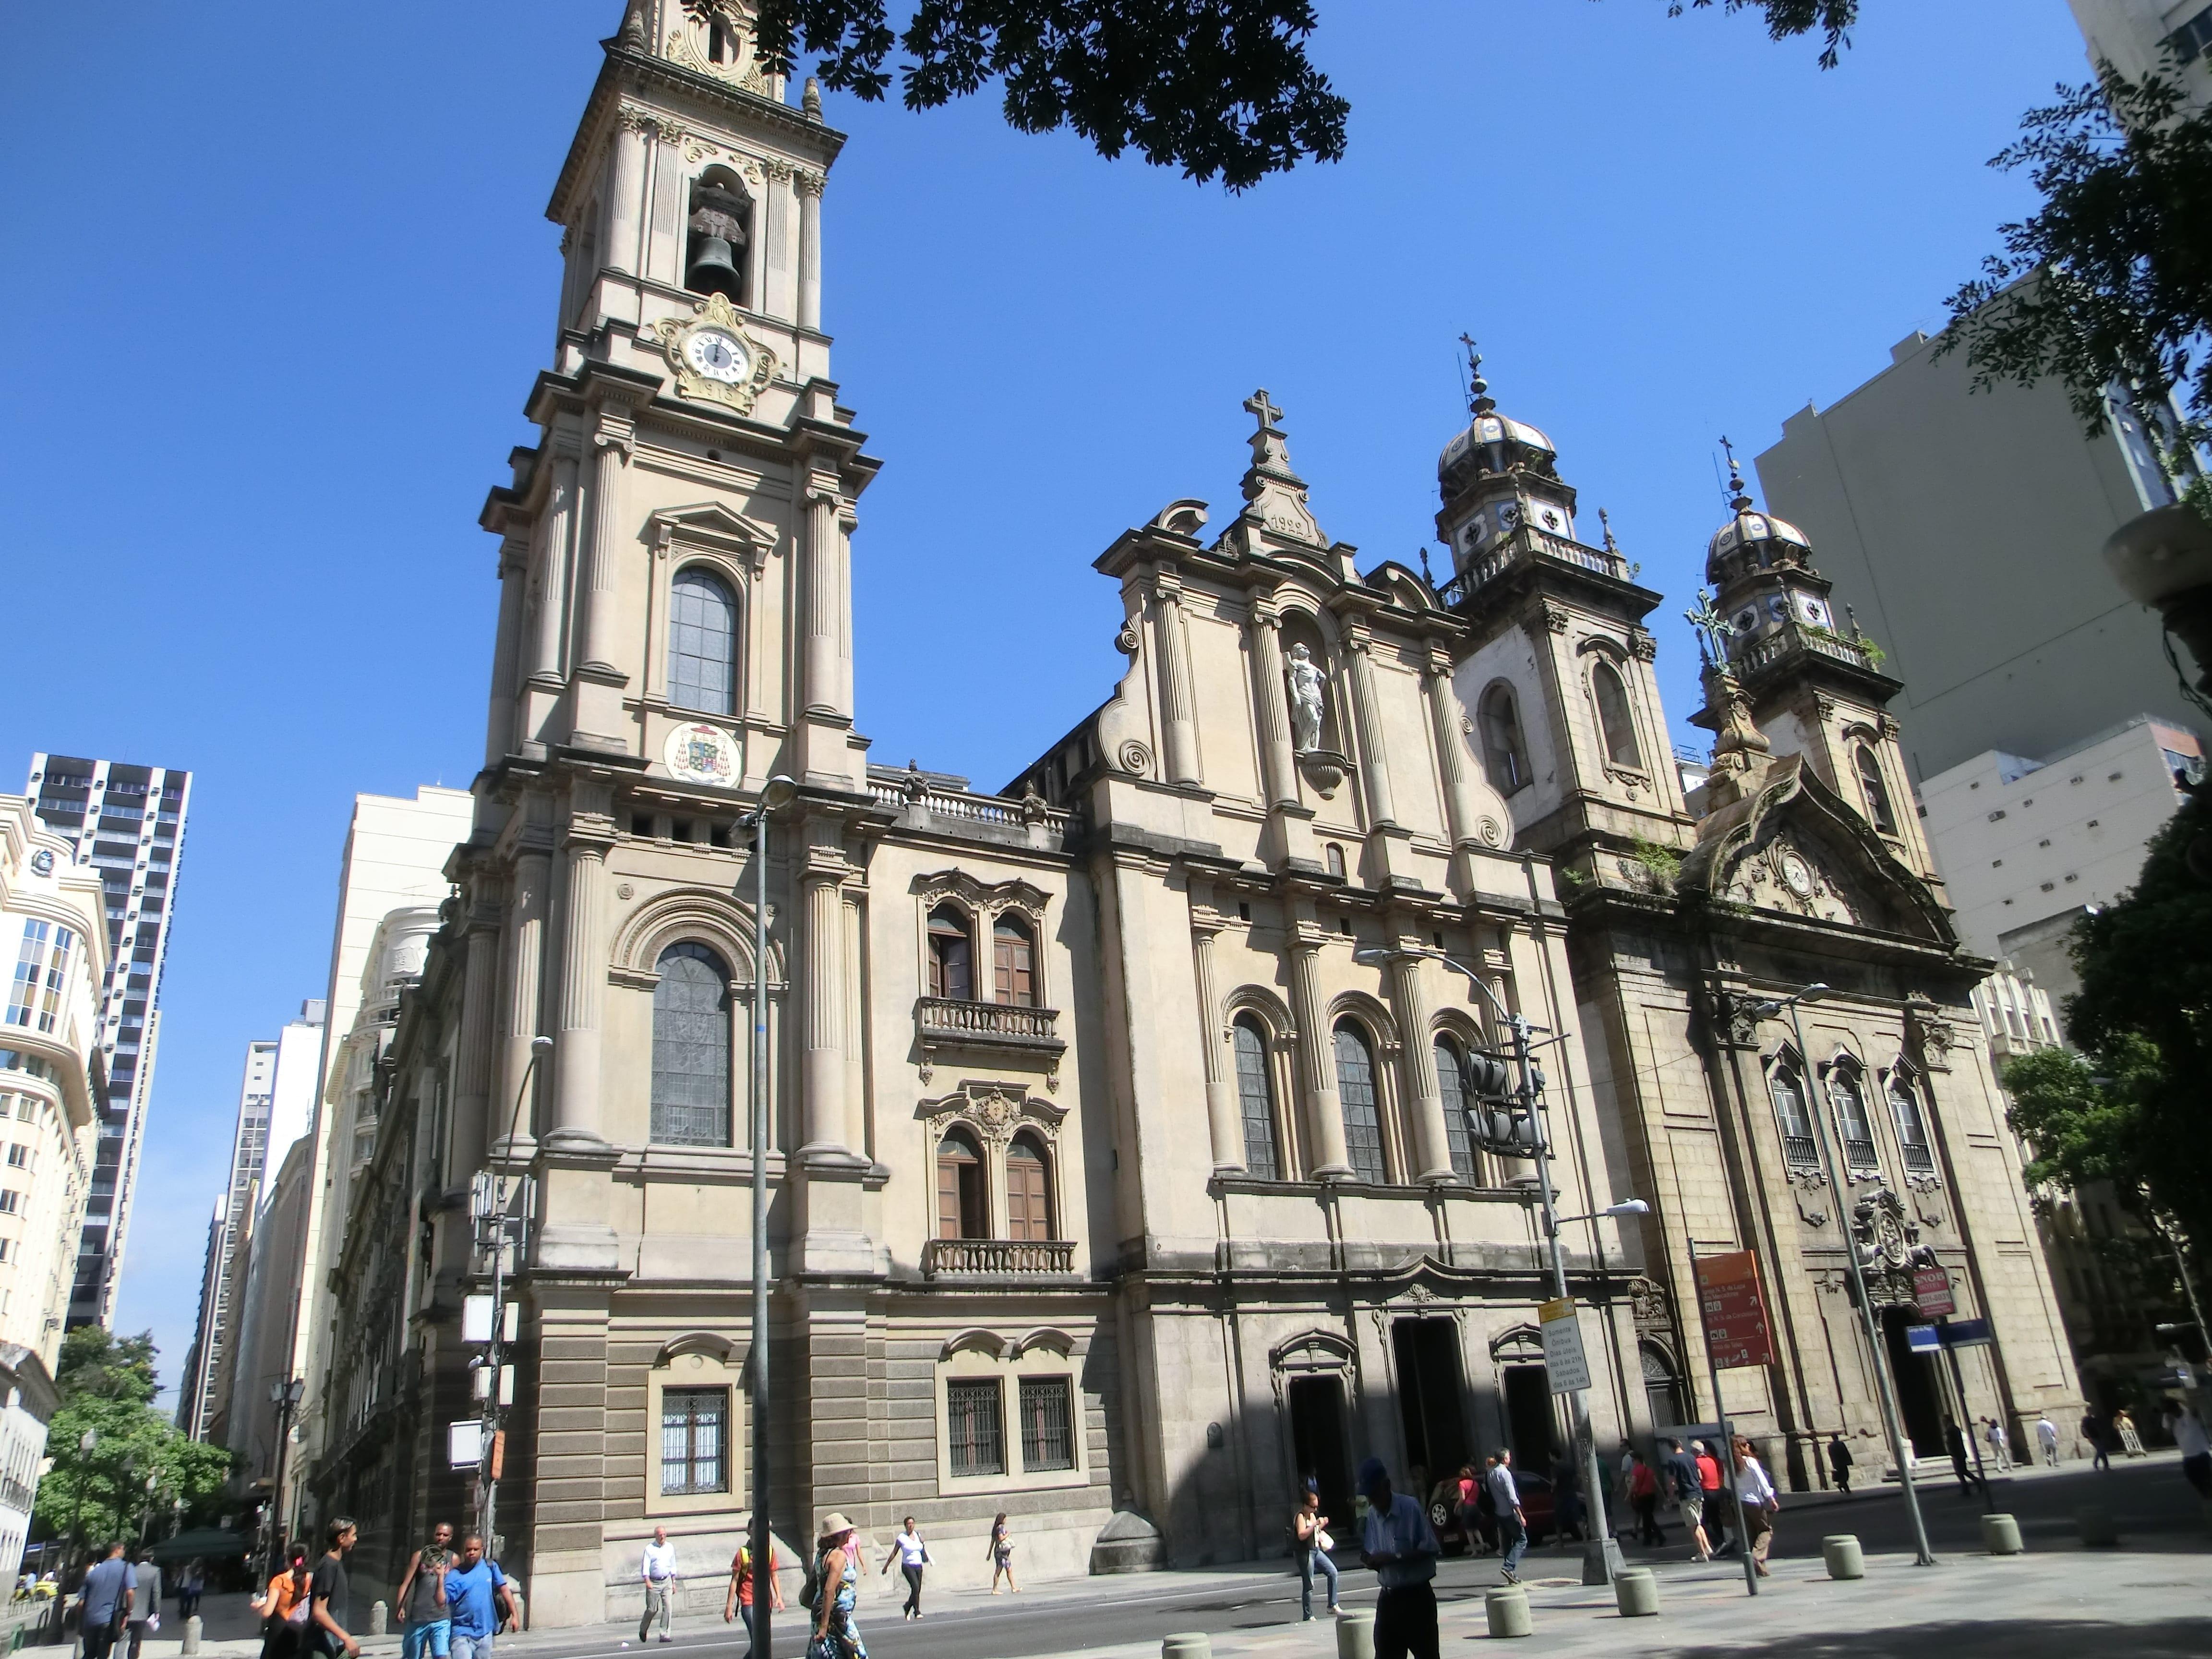 Rio de Janeiro City Center church. Fun things to do in rio de janeiro. Coisas divertidas para fazer no Rio de Janeiro